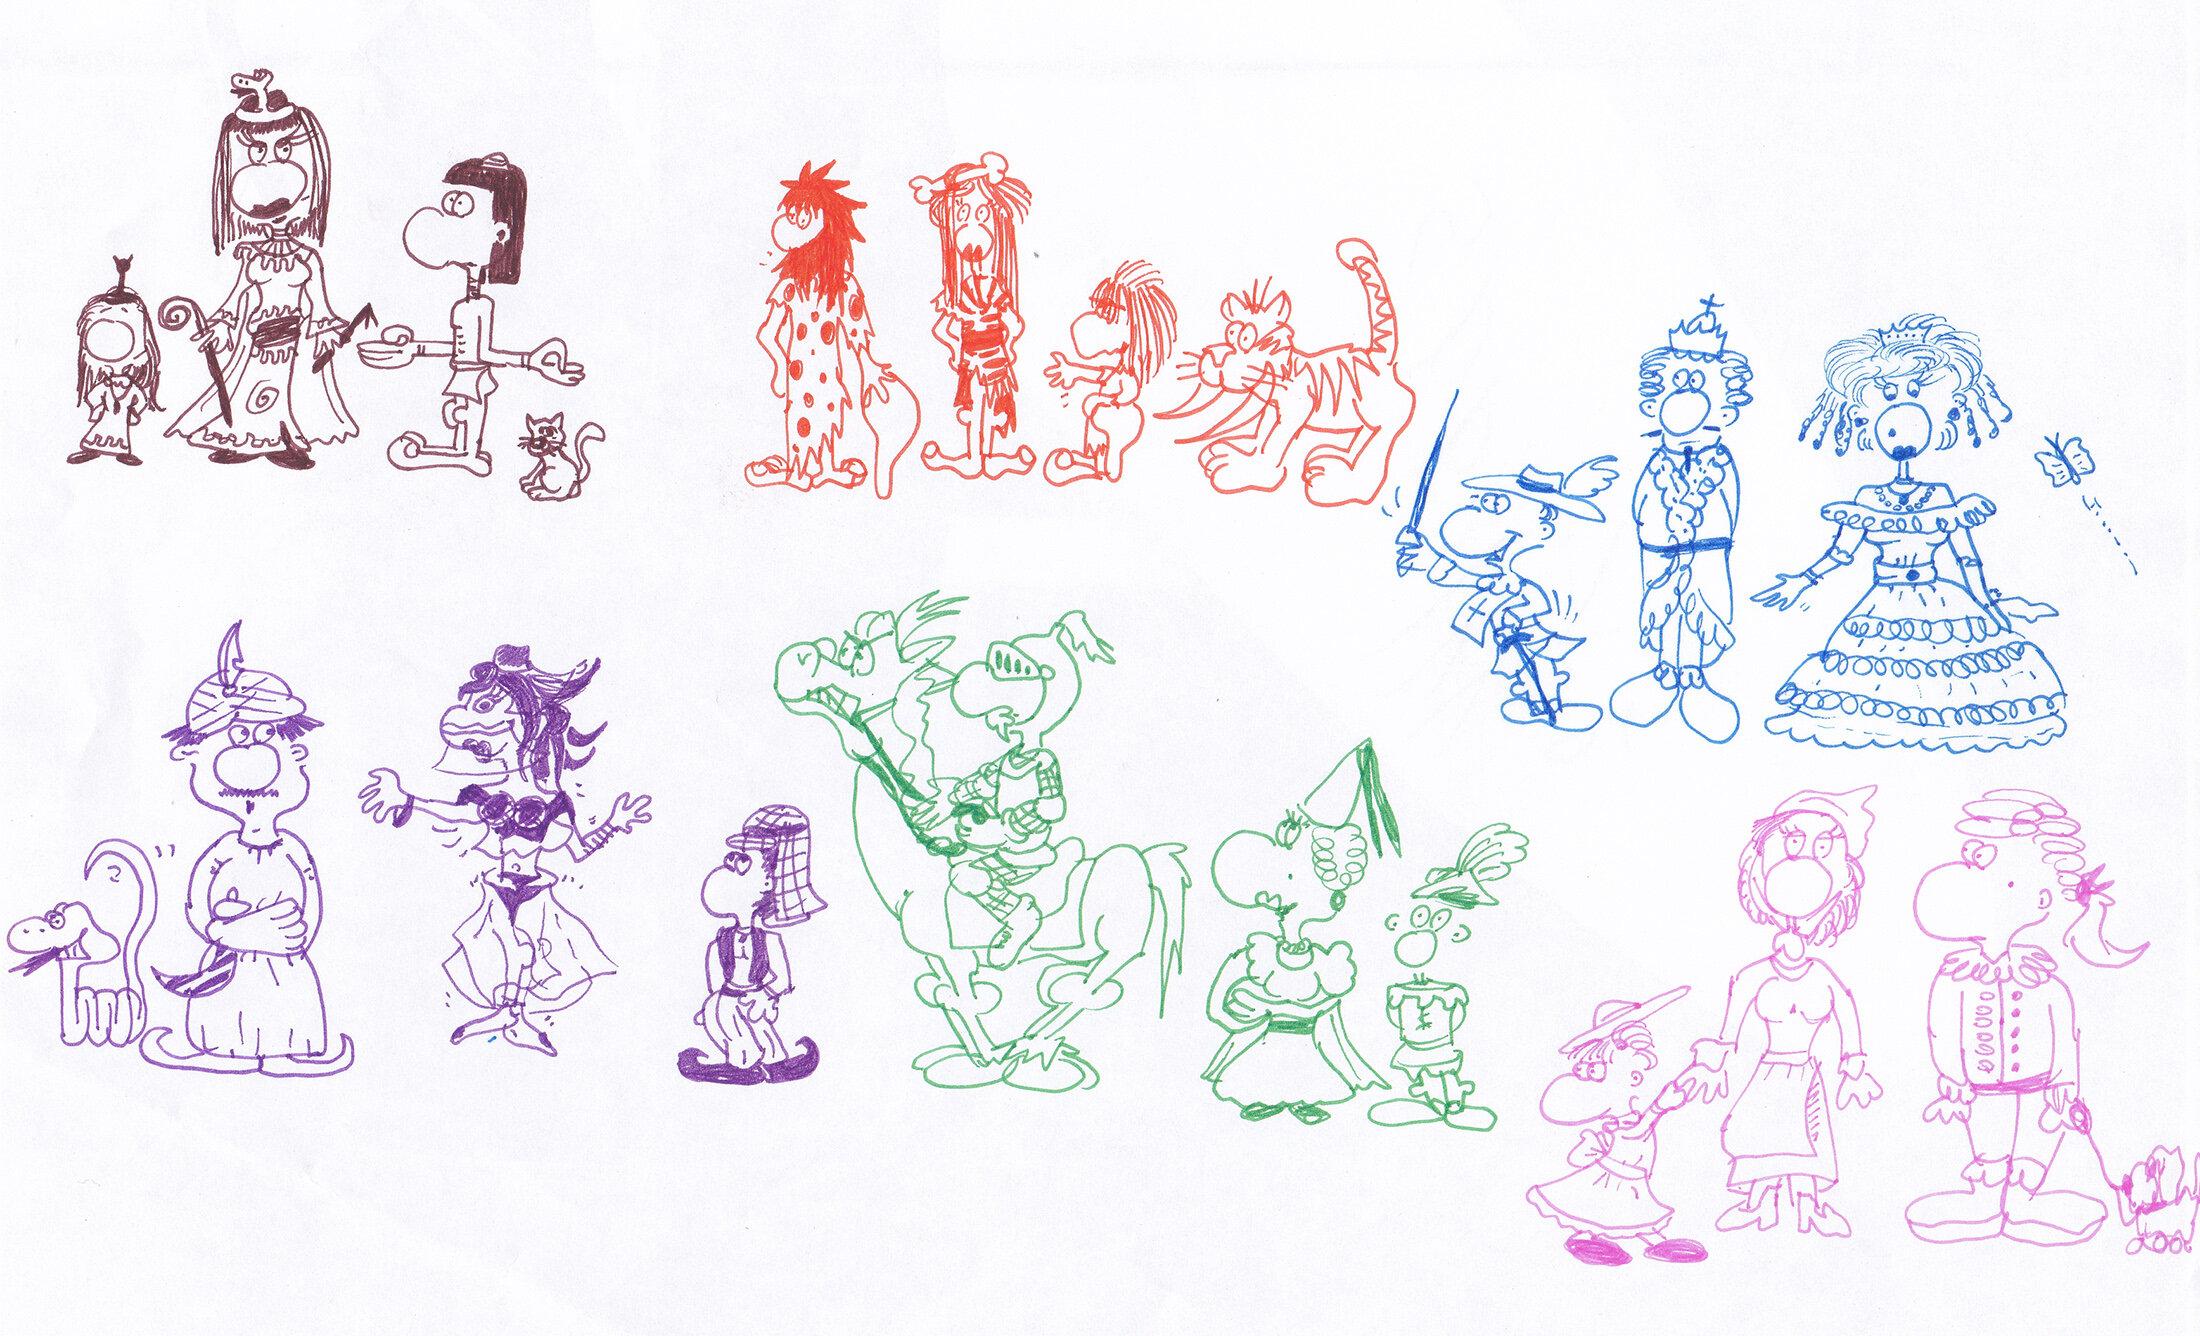 Comicfiguren aus verschiedenen Epochen/Kulturen (11/1995)